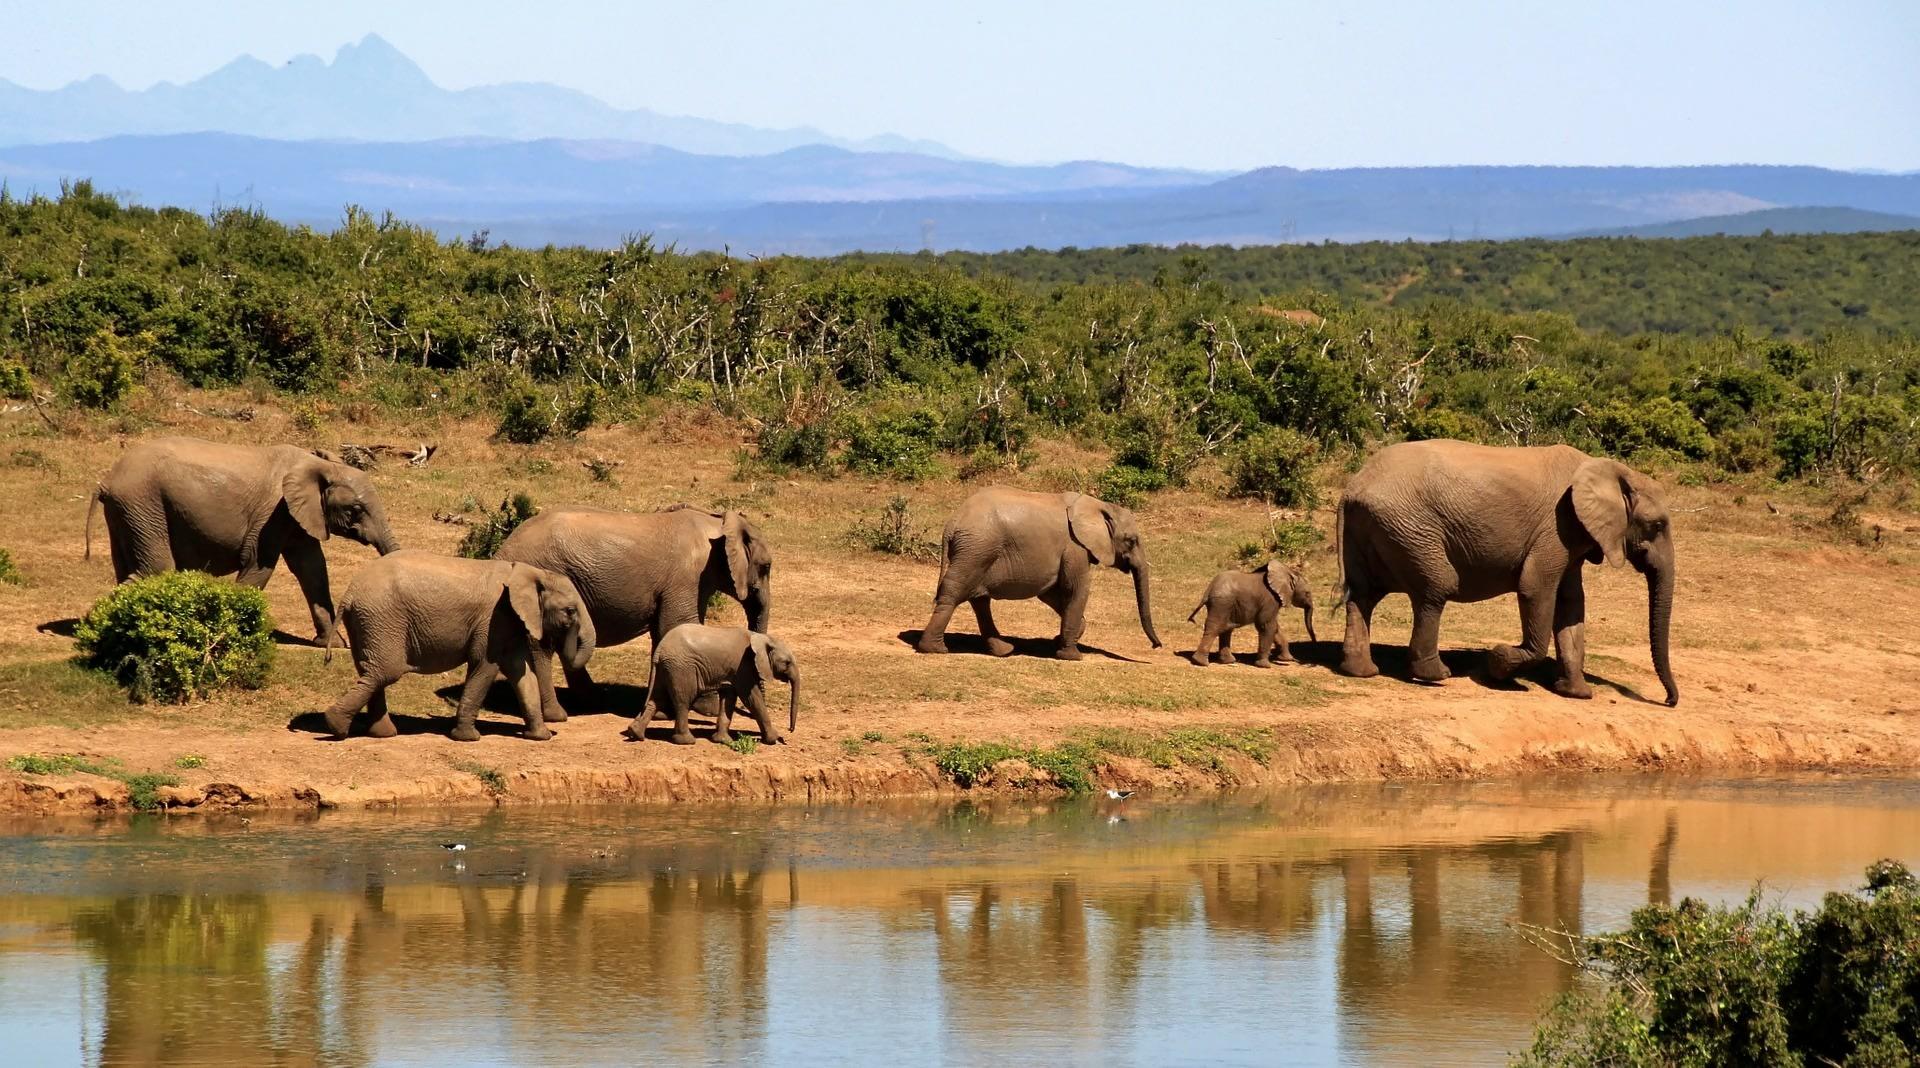 Banjul Safari Park